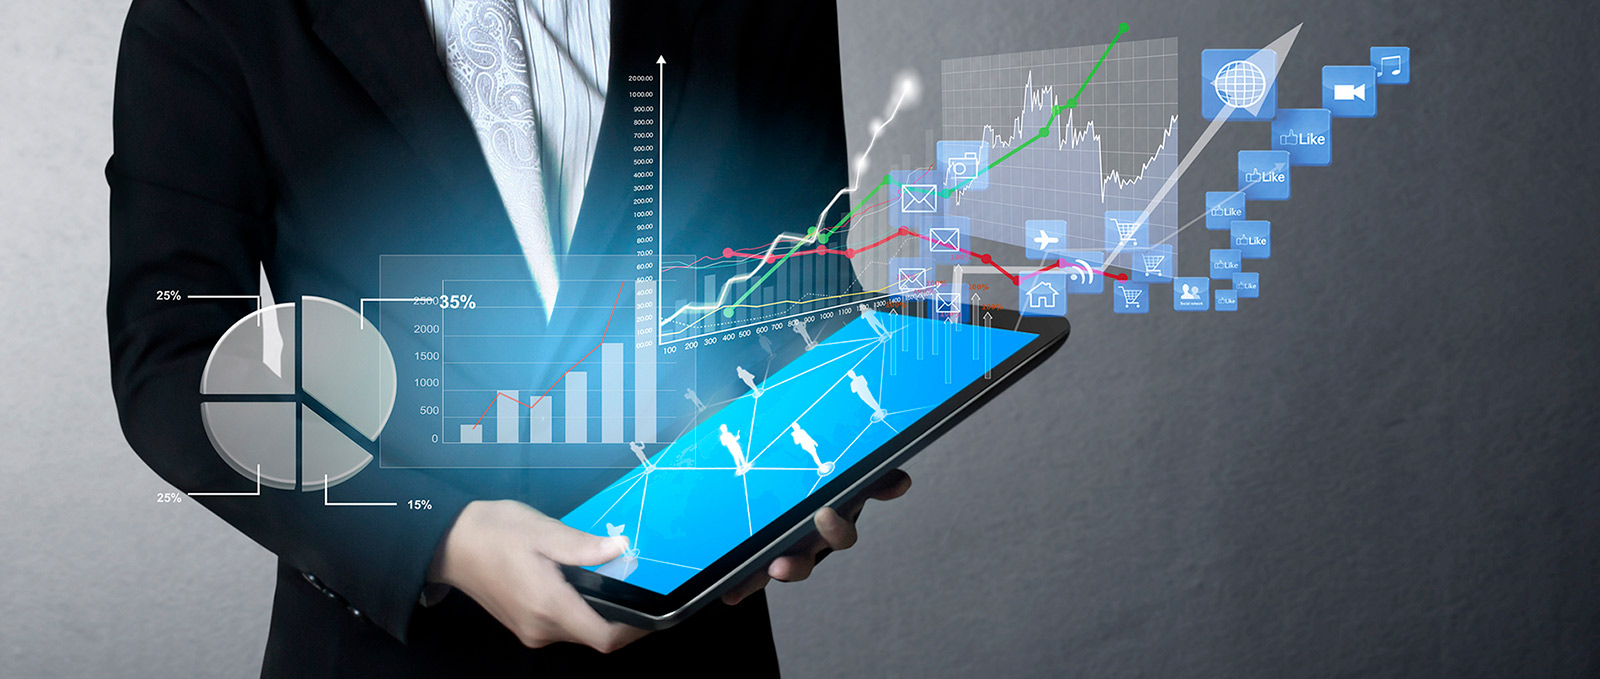 Adobe : transformez votre marketing digital